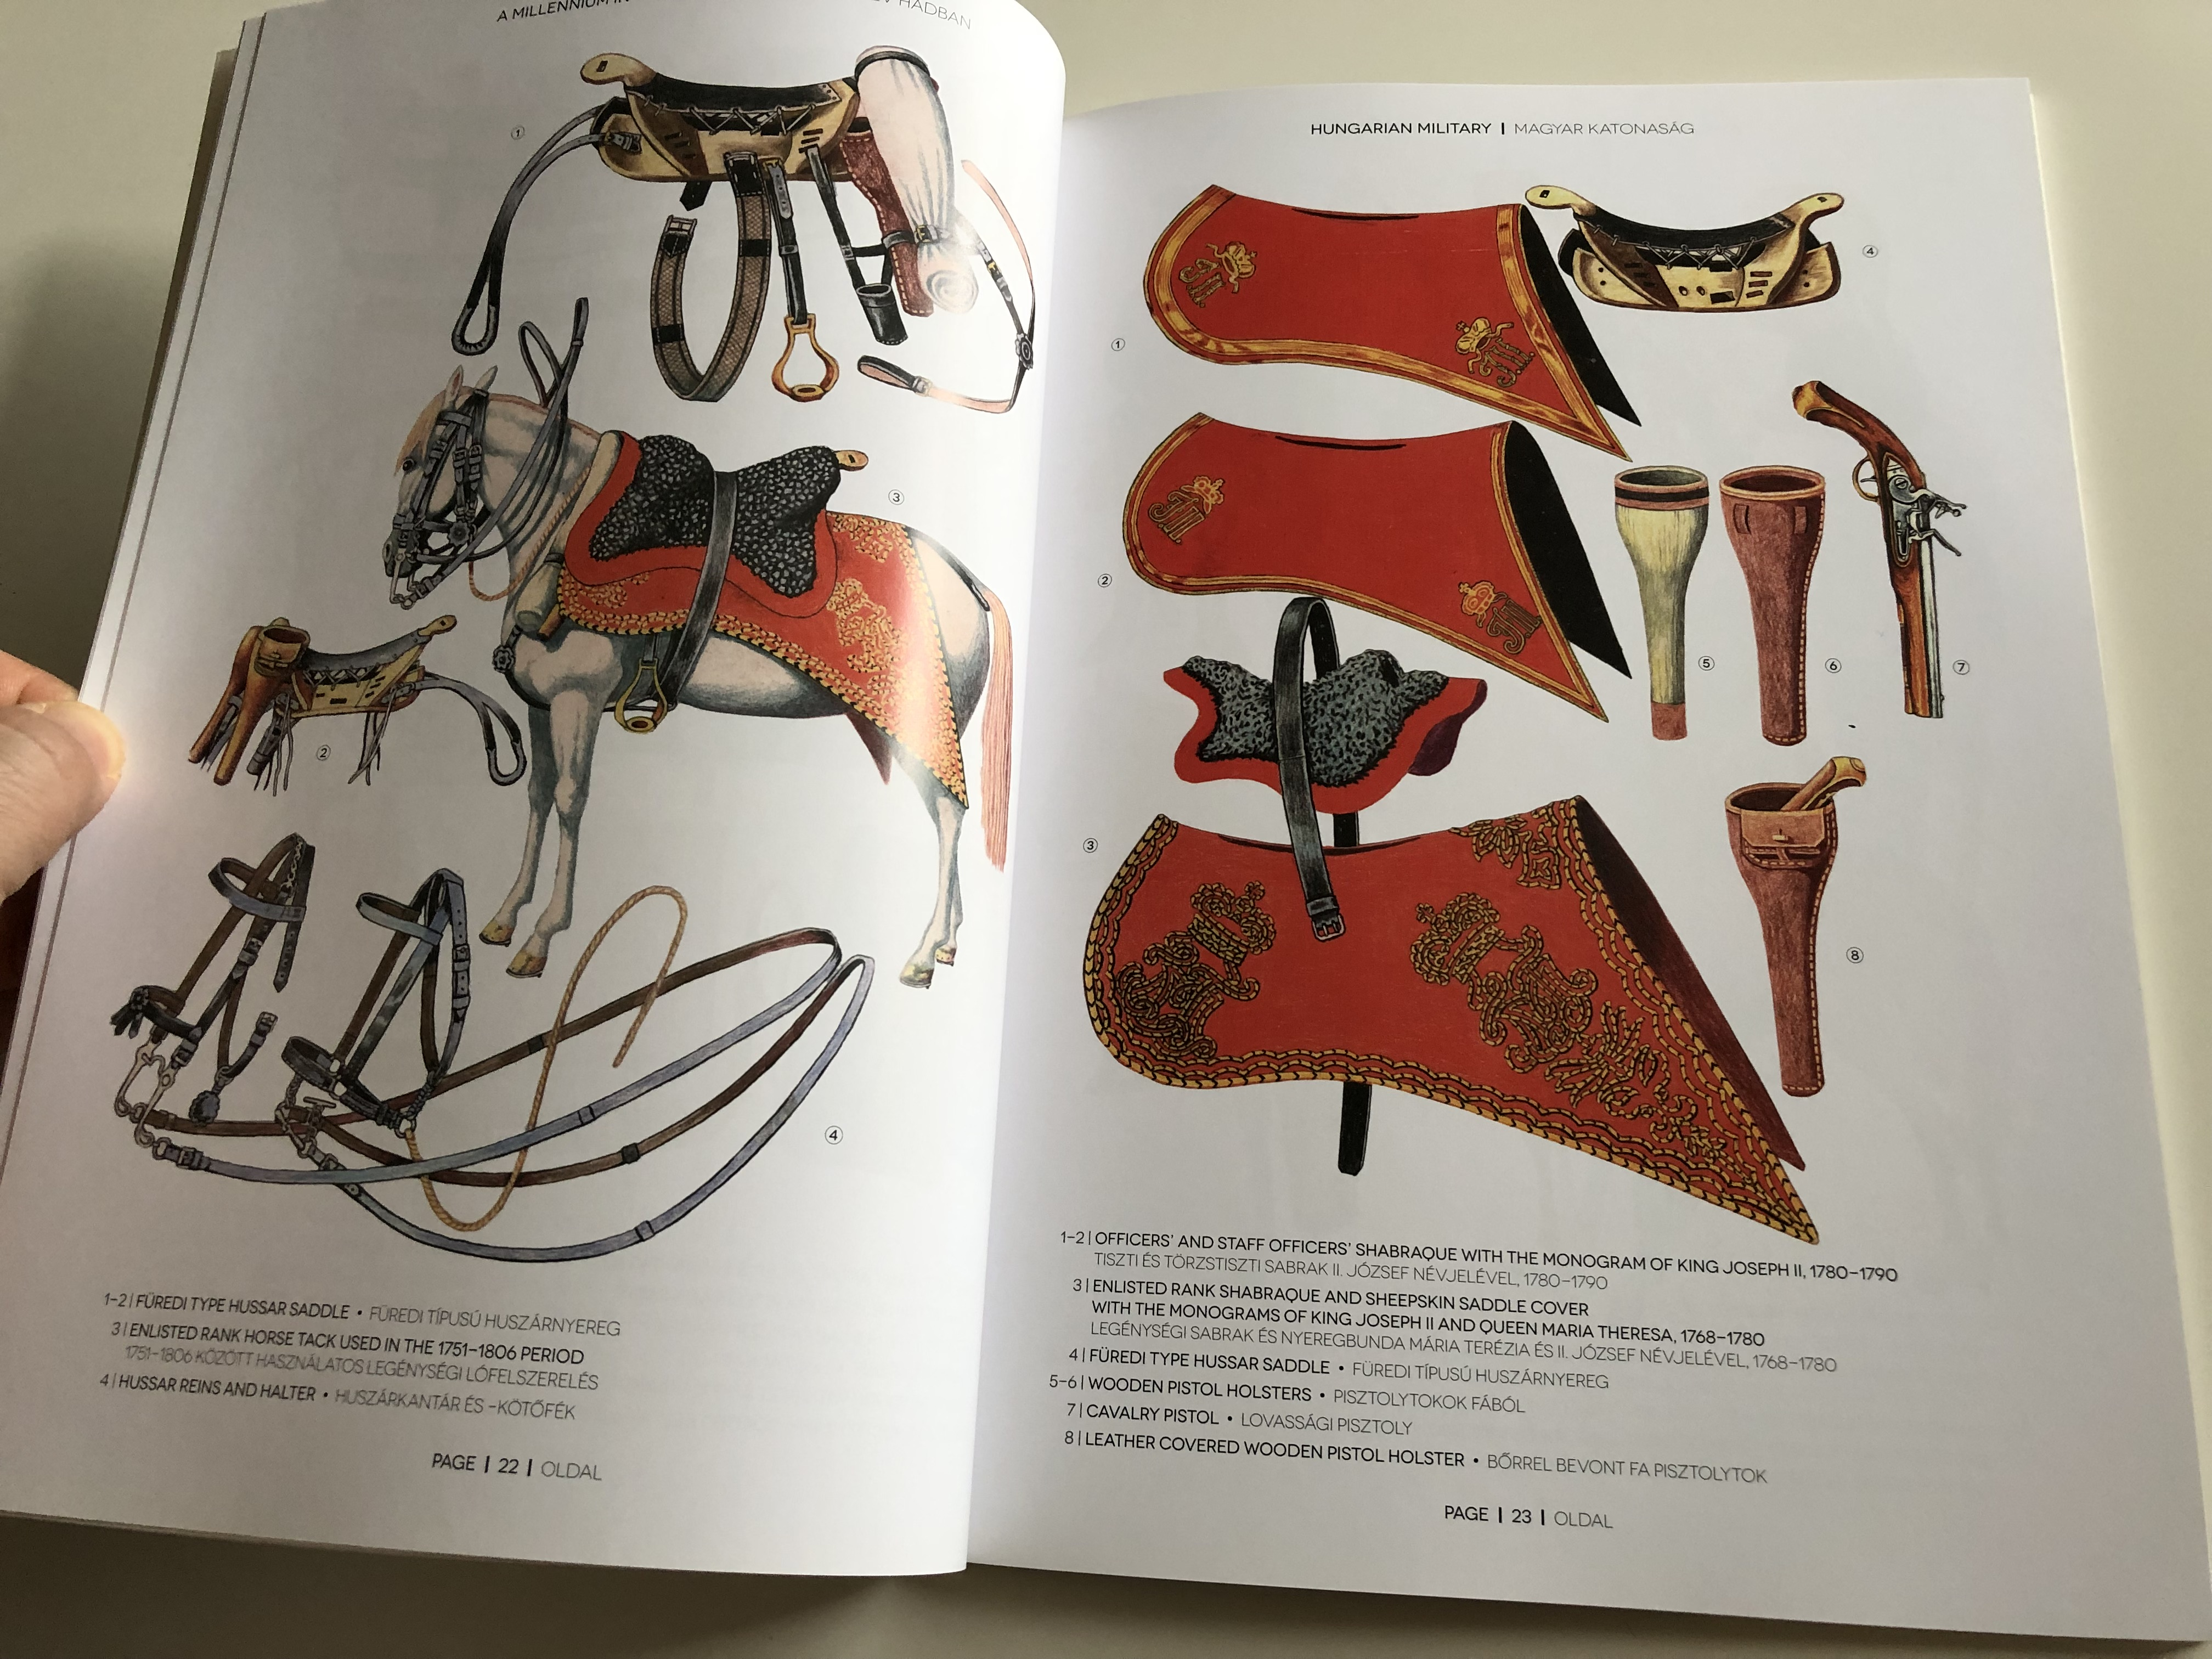 hungarian-military-1768-1848-by-gy-z-somogyi-magyar-katonas-g-1768-1848-a-millennium-in-the-military-egy-ezred-v-hadban-paperback-2013-hm-zr-nyi-6-.jpg